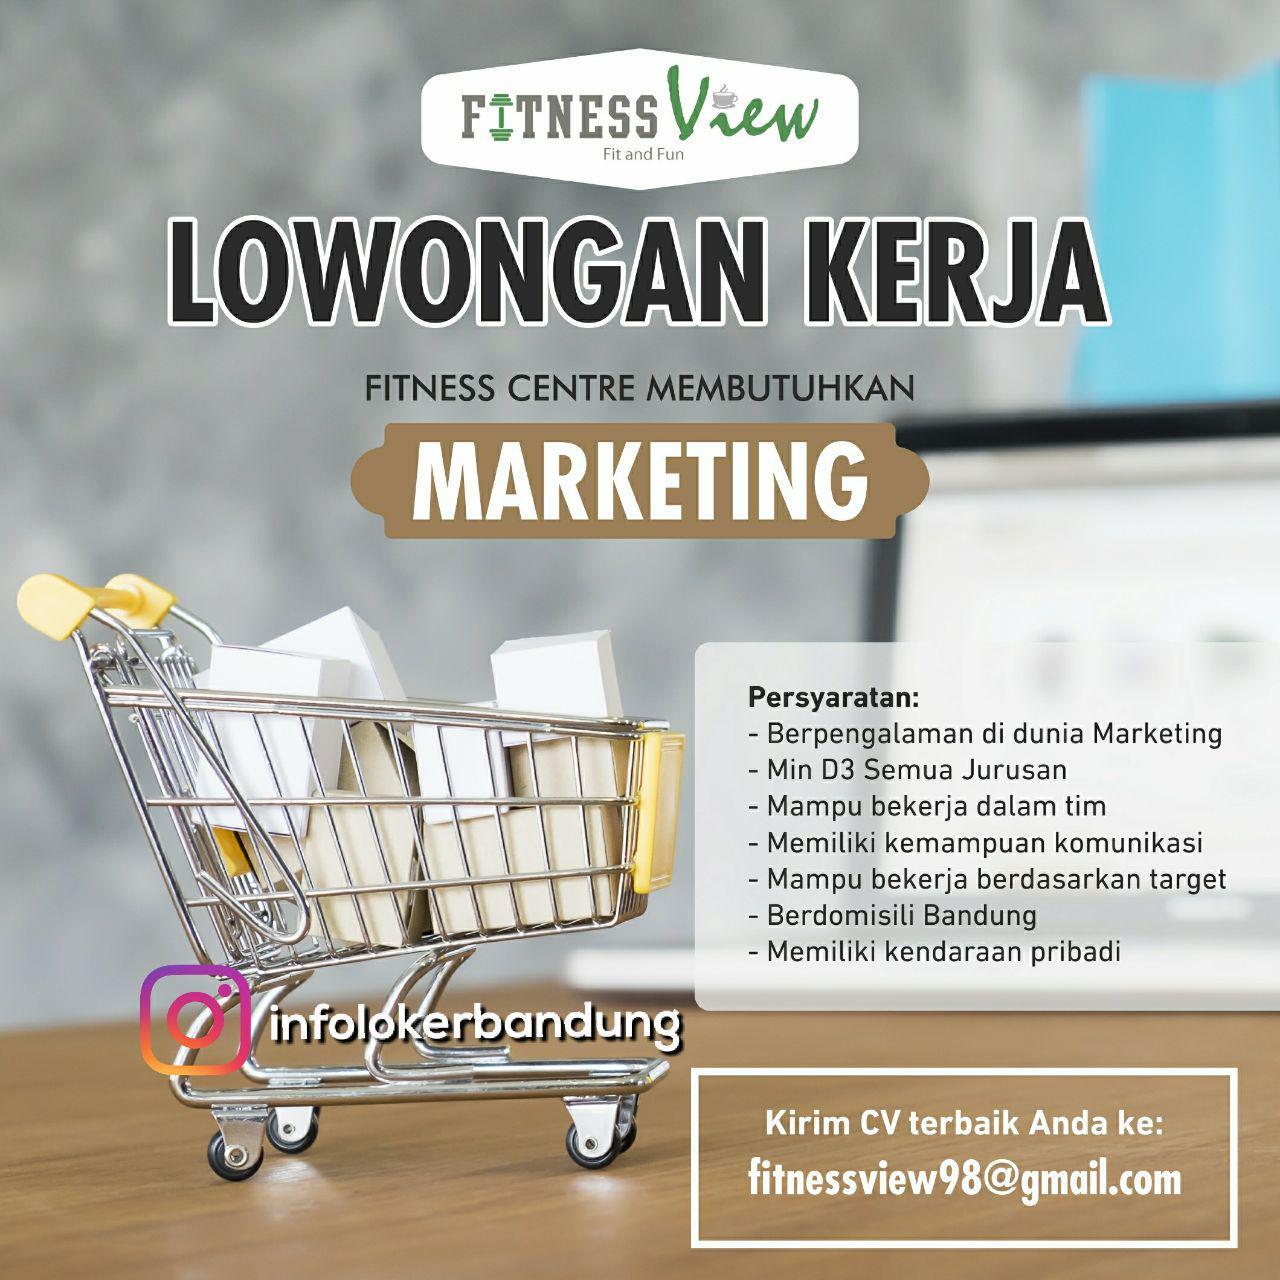 Lowongan Kerja Fitness View Bandung Agustus 2017